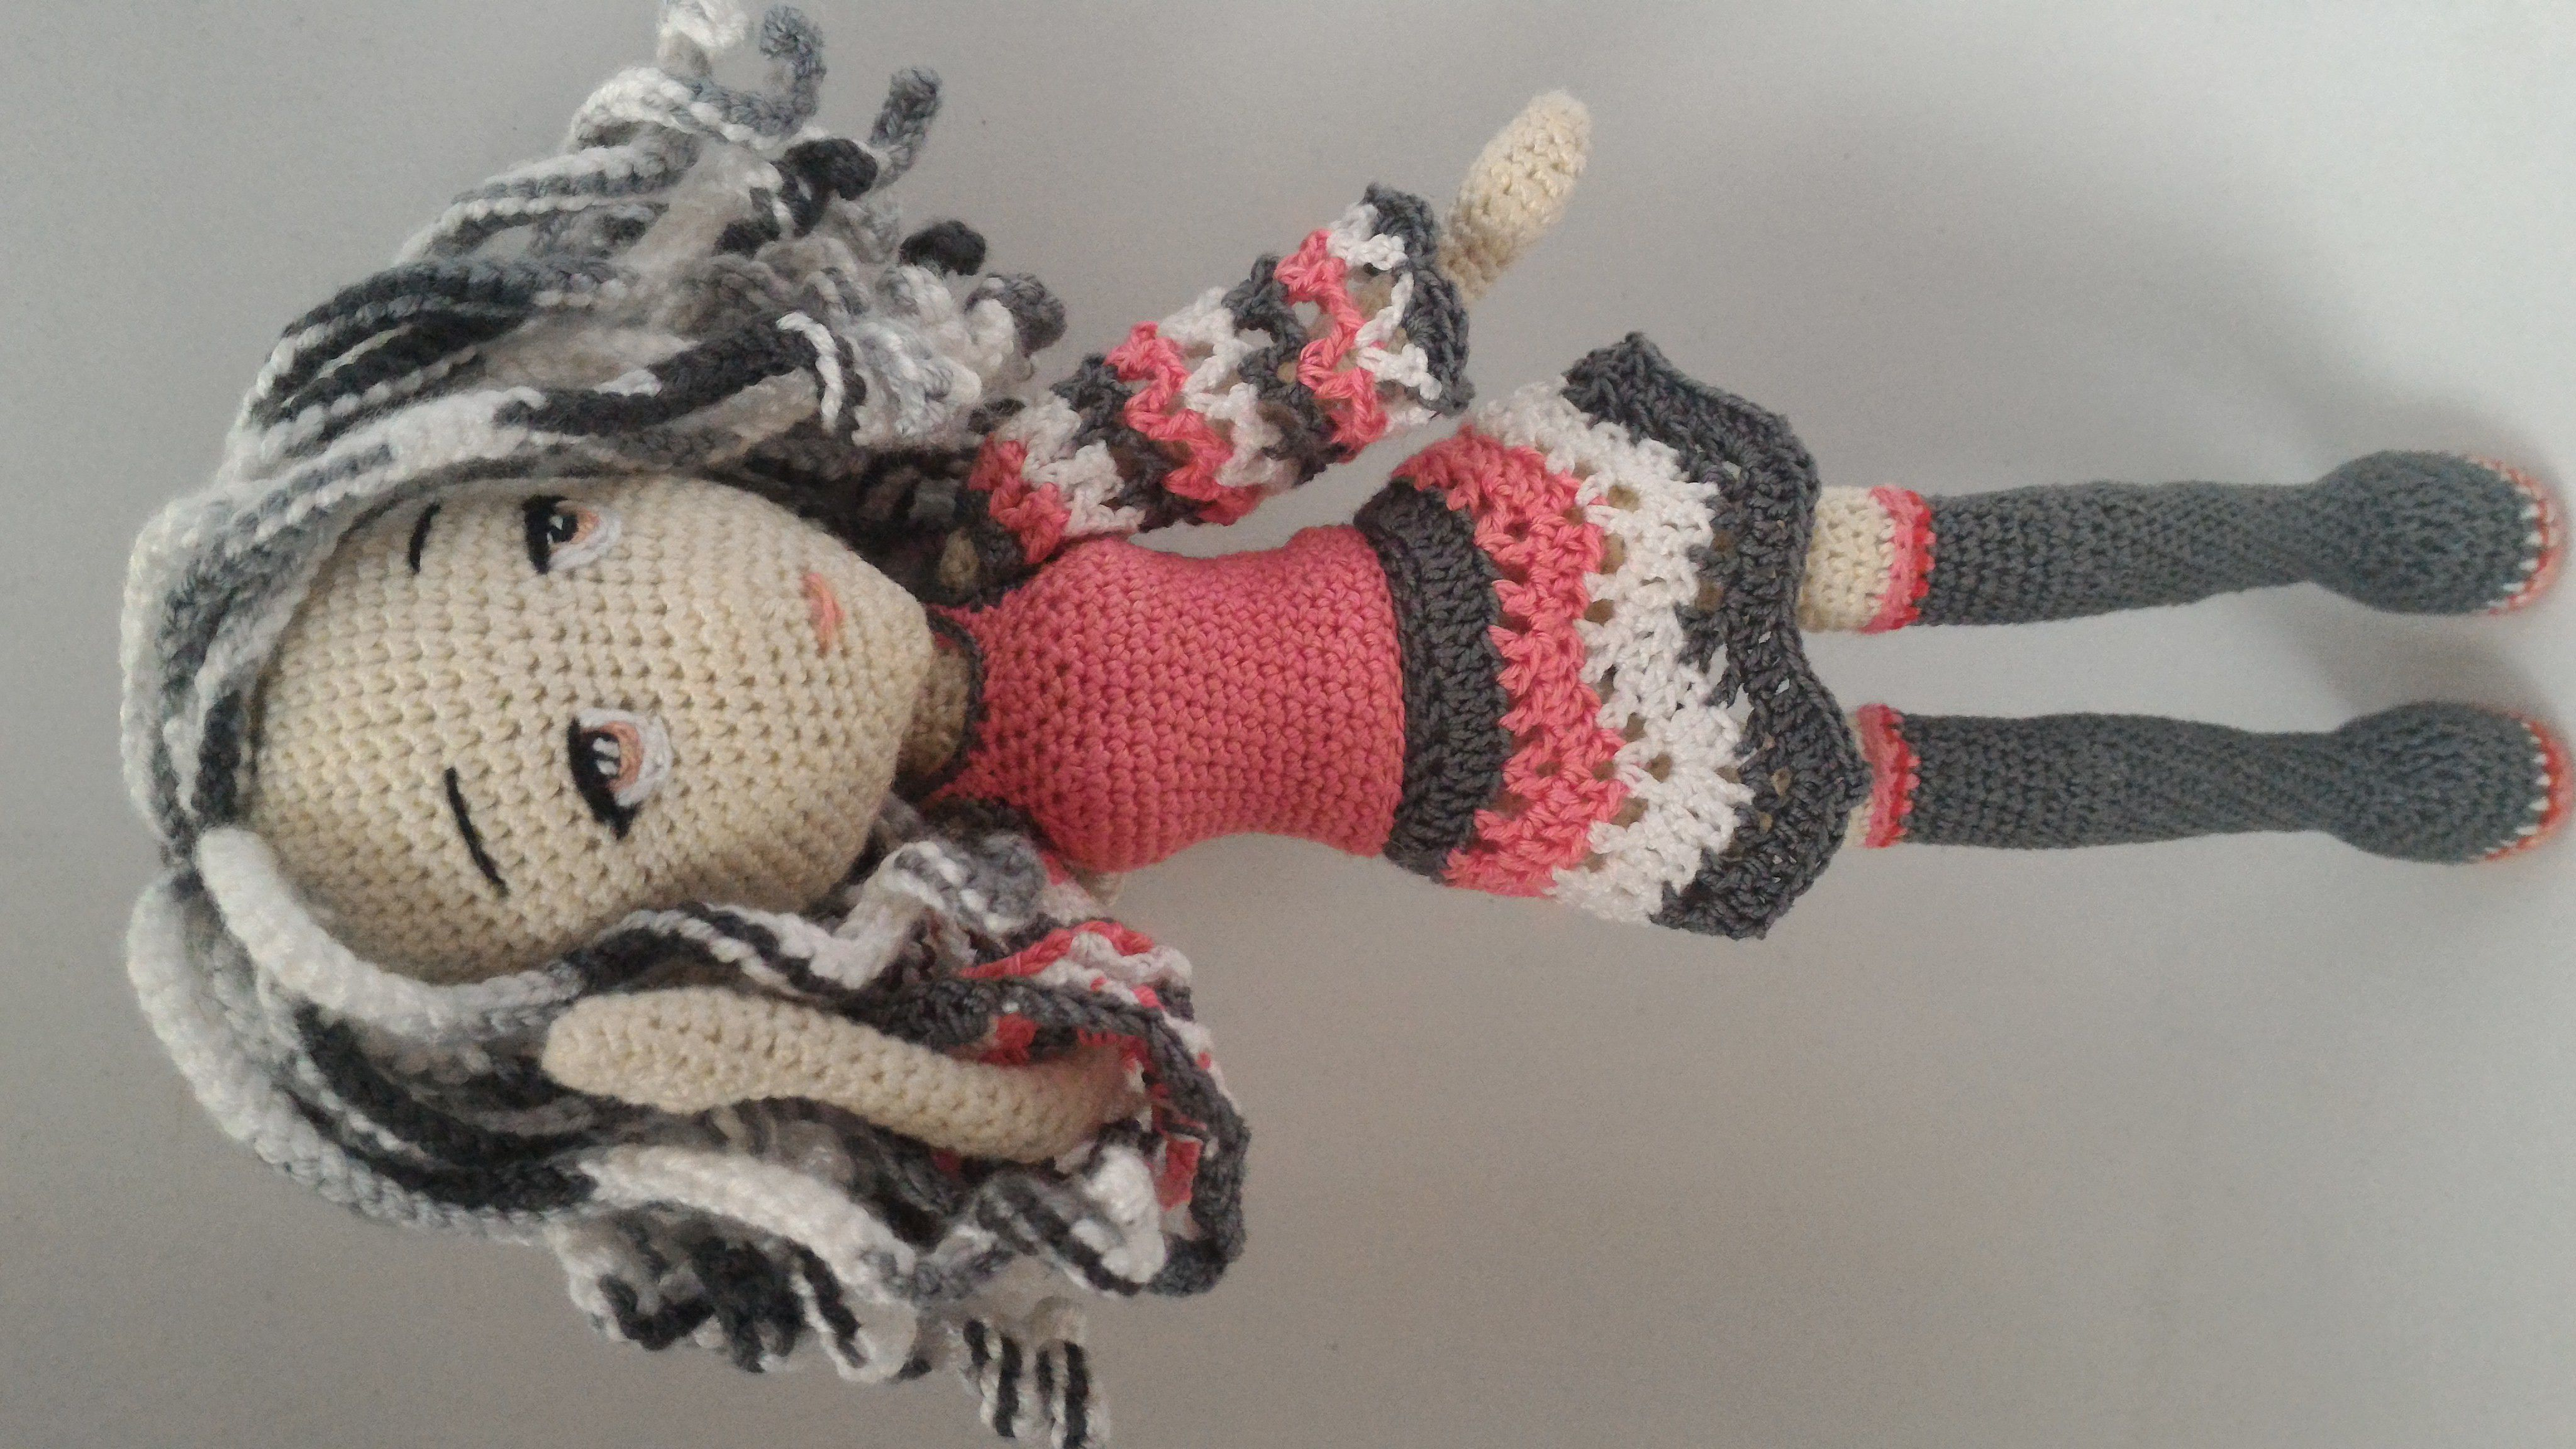 крючком семинарами каркасная связанная амигуруми кукла подарок